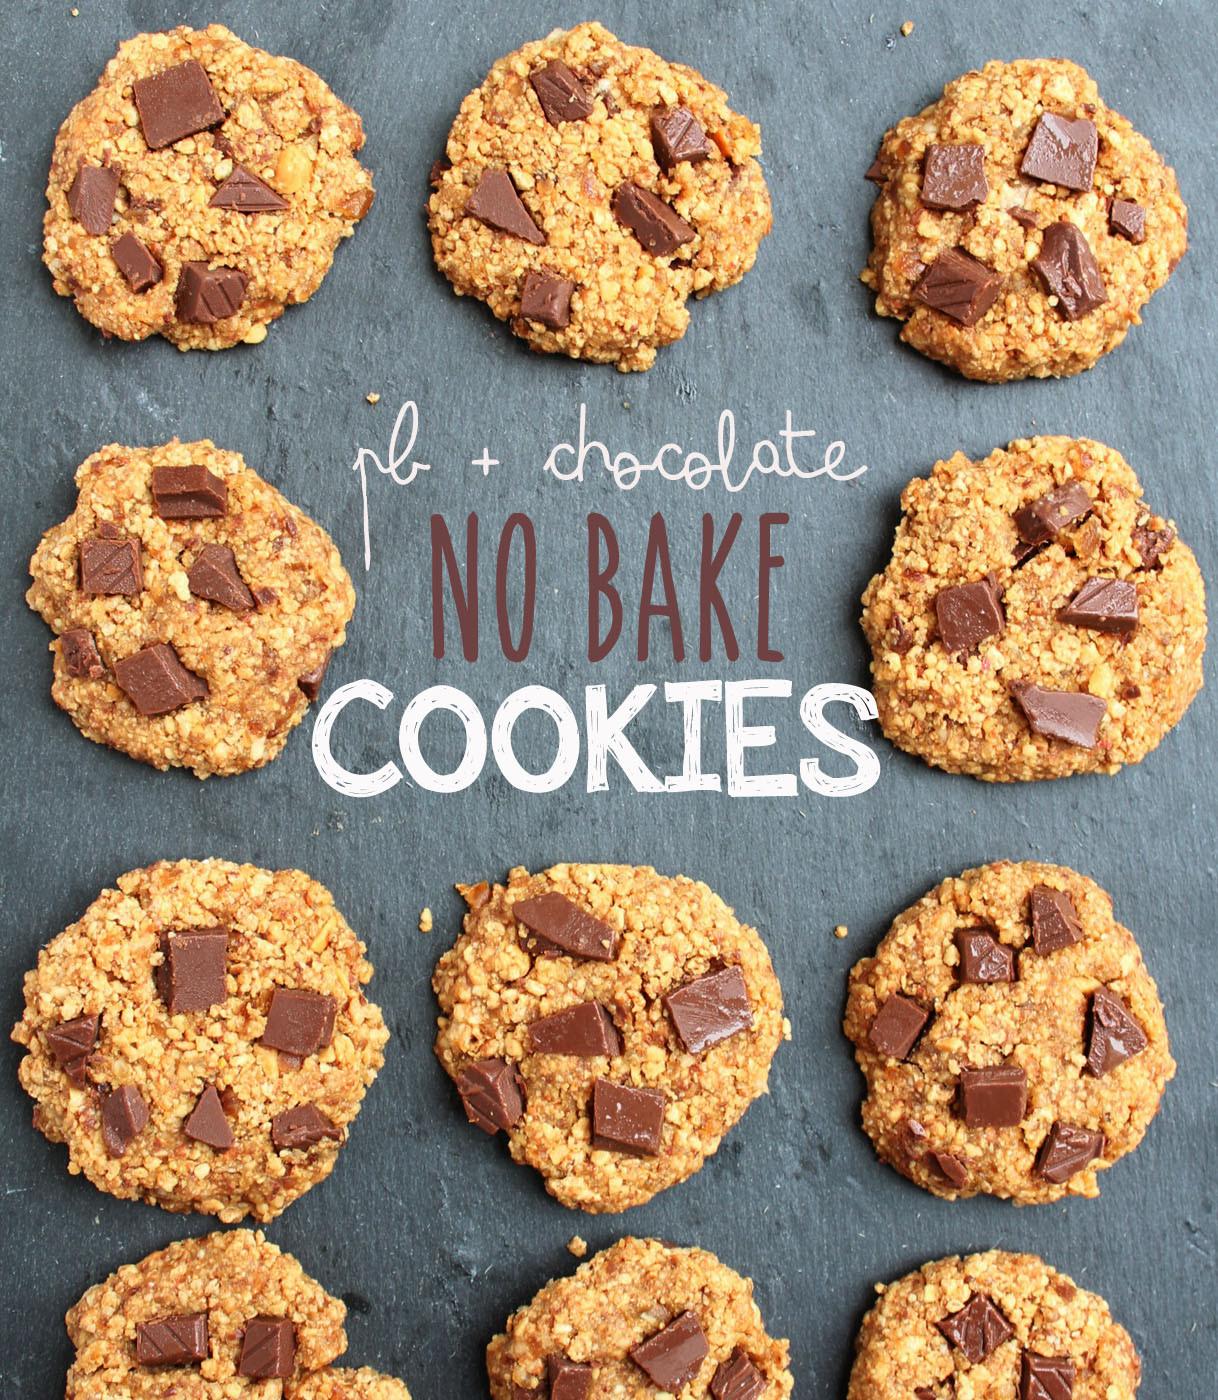 Healthy Peanut Butter No Bake Cookies  No Bake Healthy Peanut Butter Chocolate Cookies